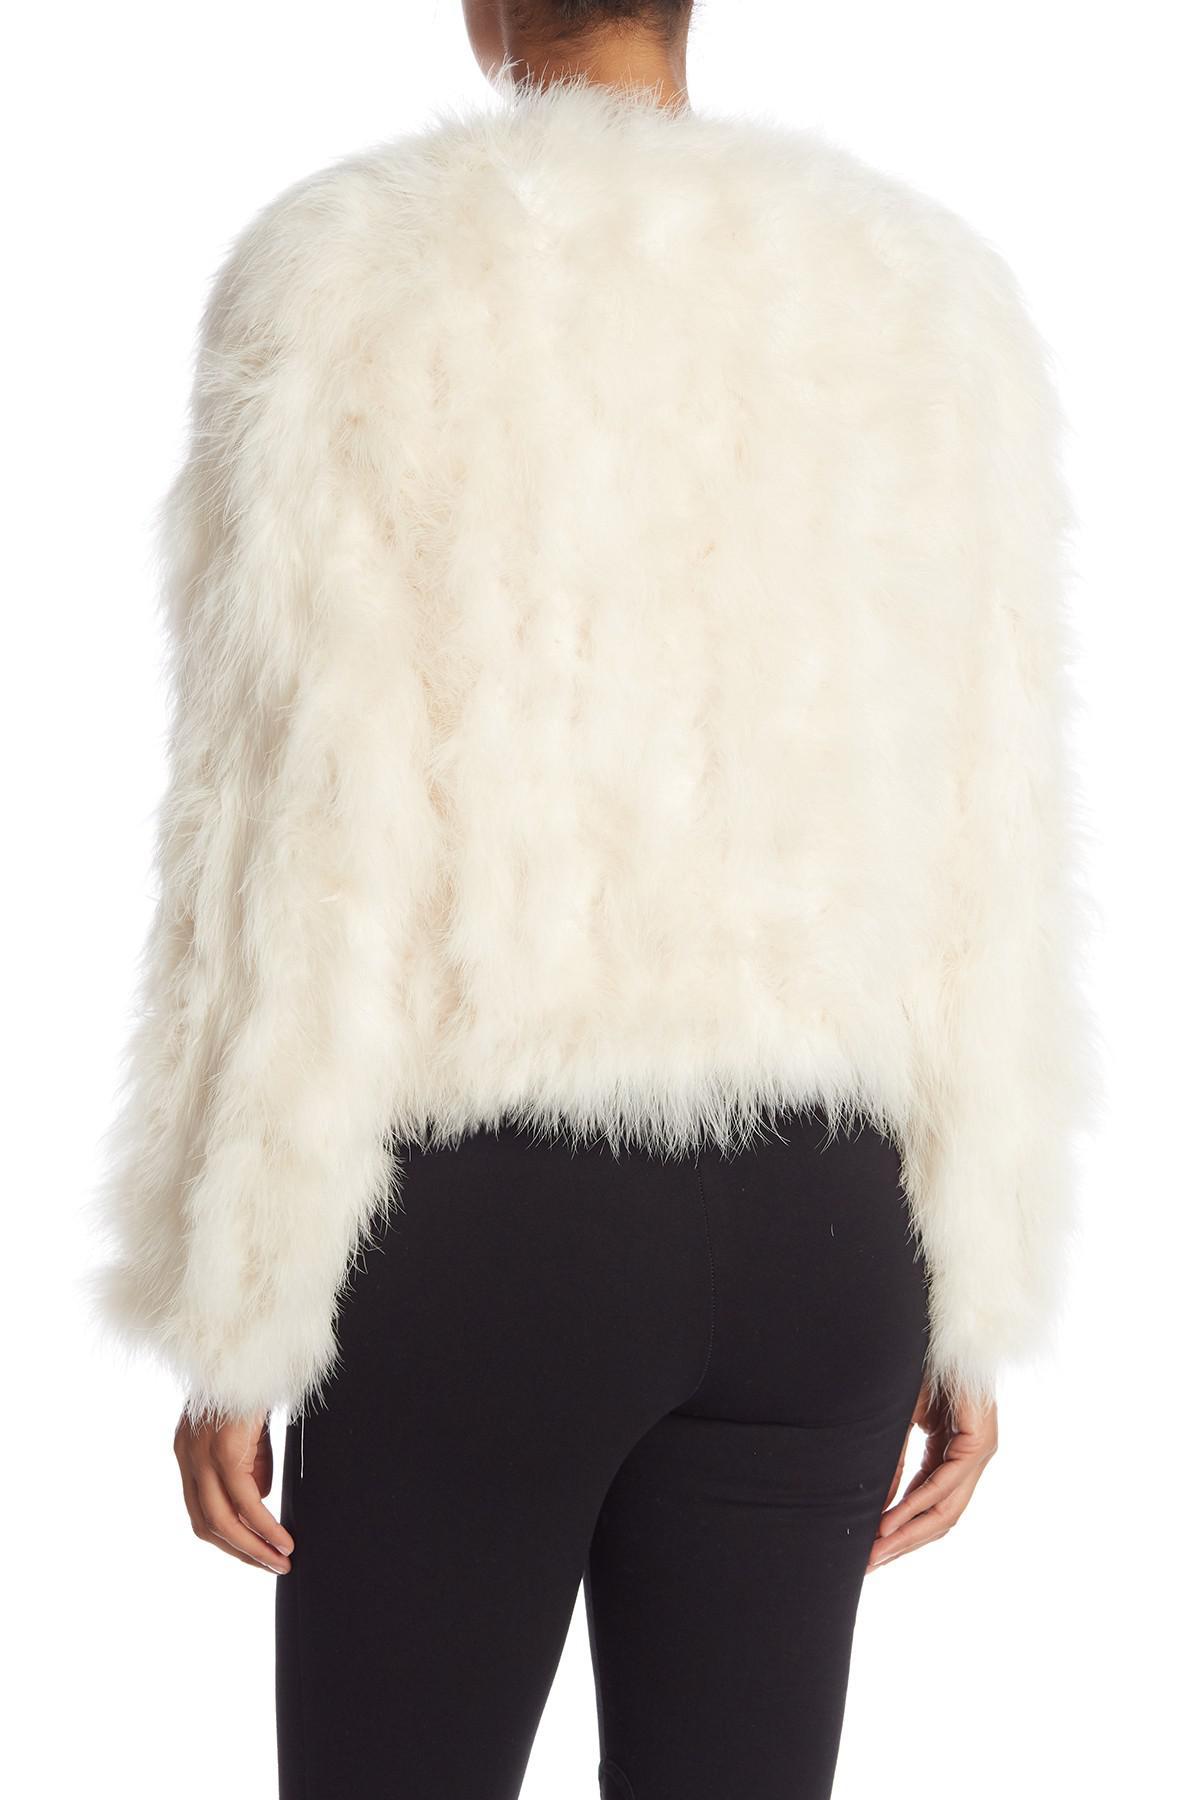 d75e56954b5 Lamarque Genuine Turkey Feather Jacket in White - Lyst